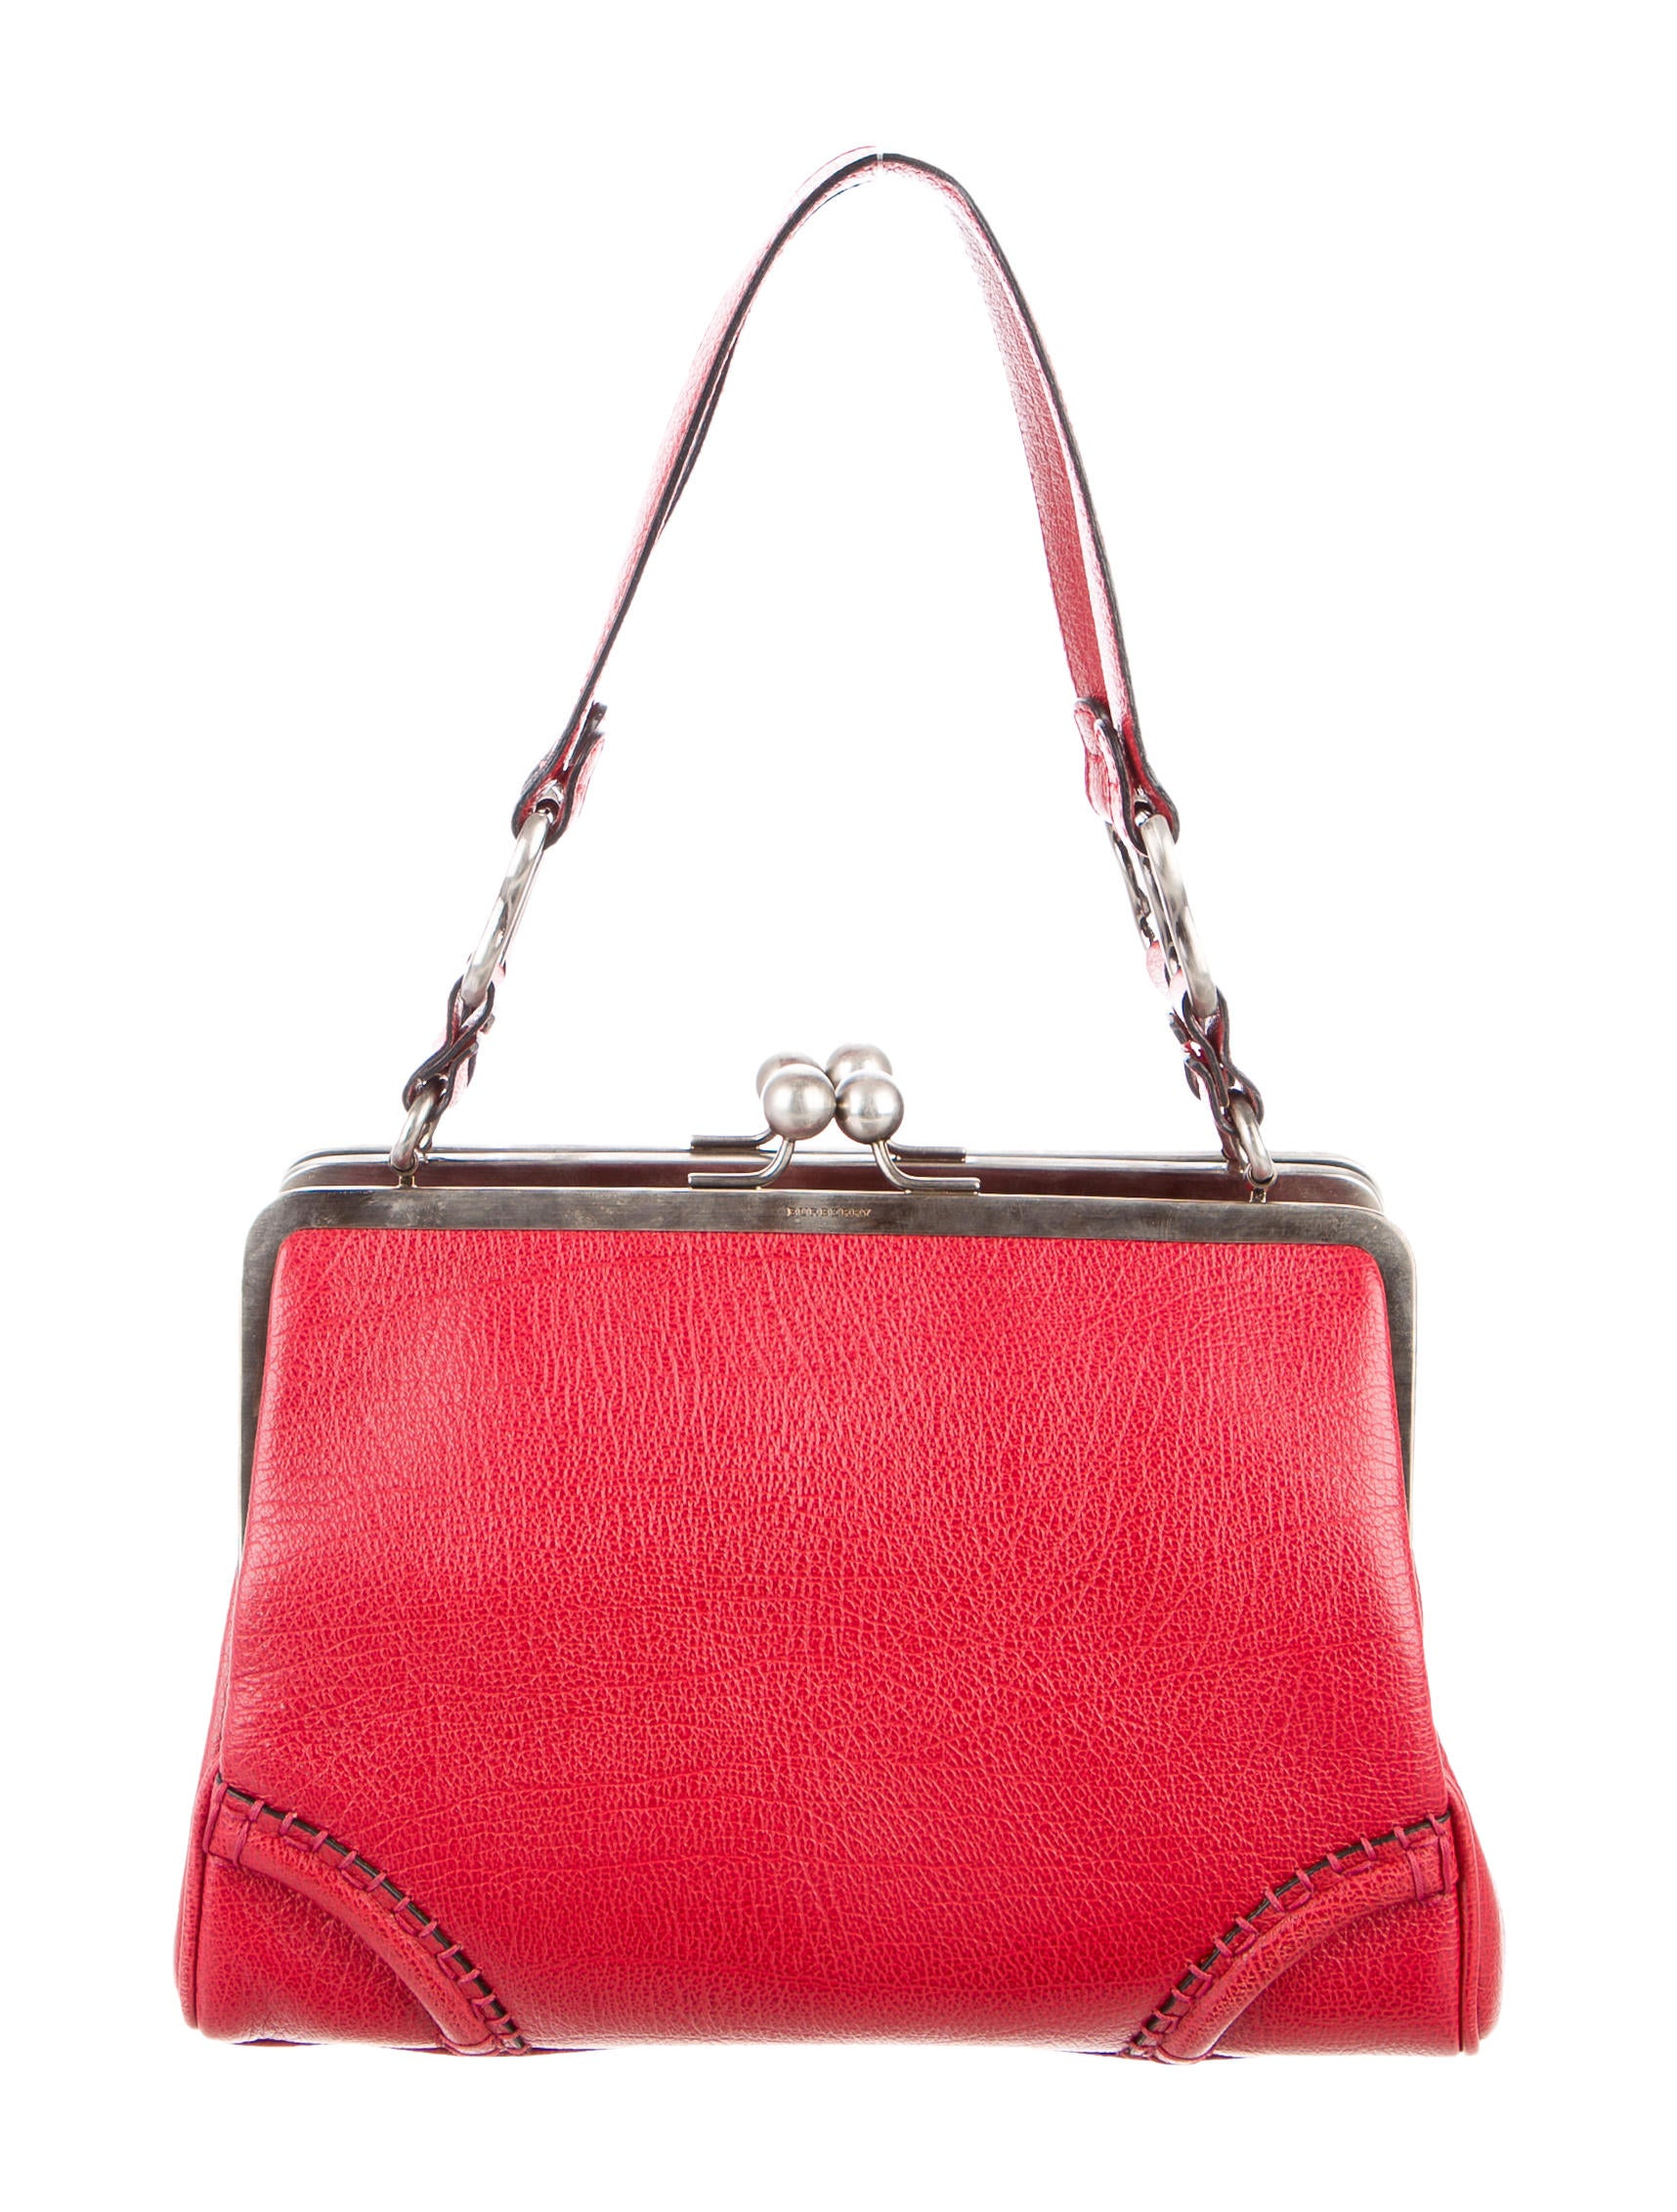 Keeping Burberry Small Bags   Burberry small leather shoulder bag handbags  bur fb23d99935b0a